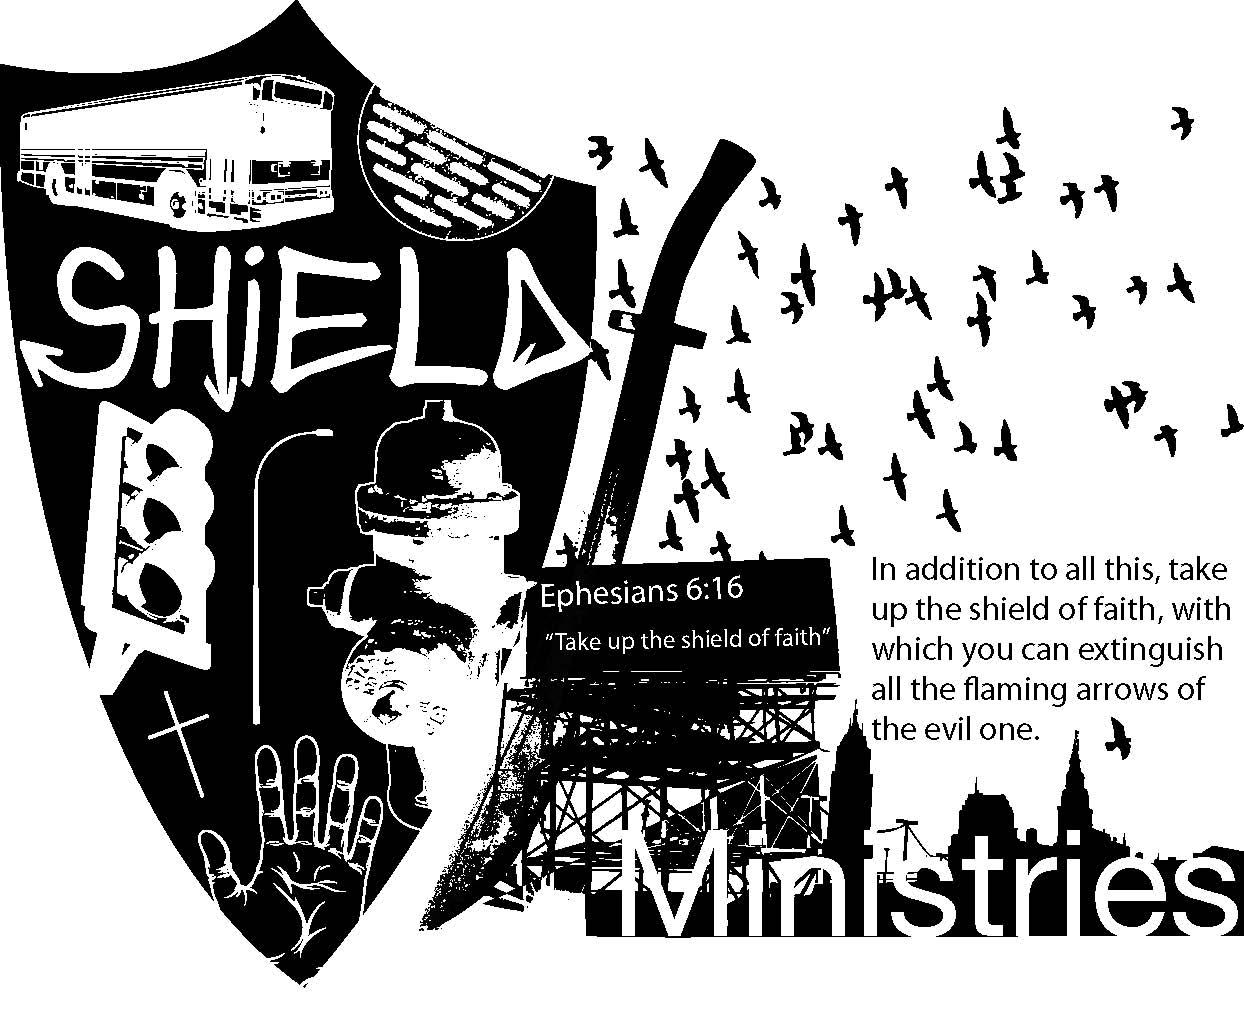 Shield-Ministries_R2_5-21-12_Page_2